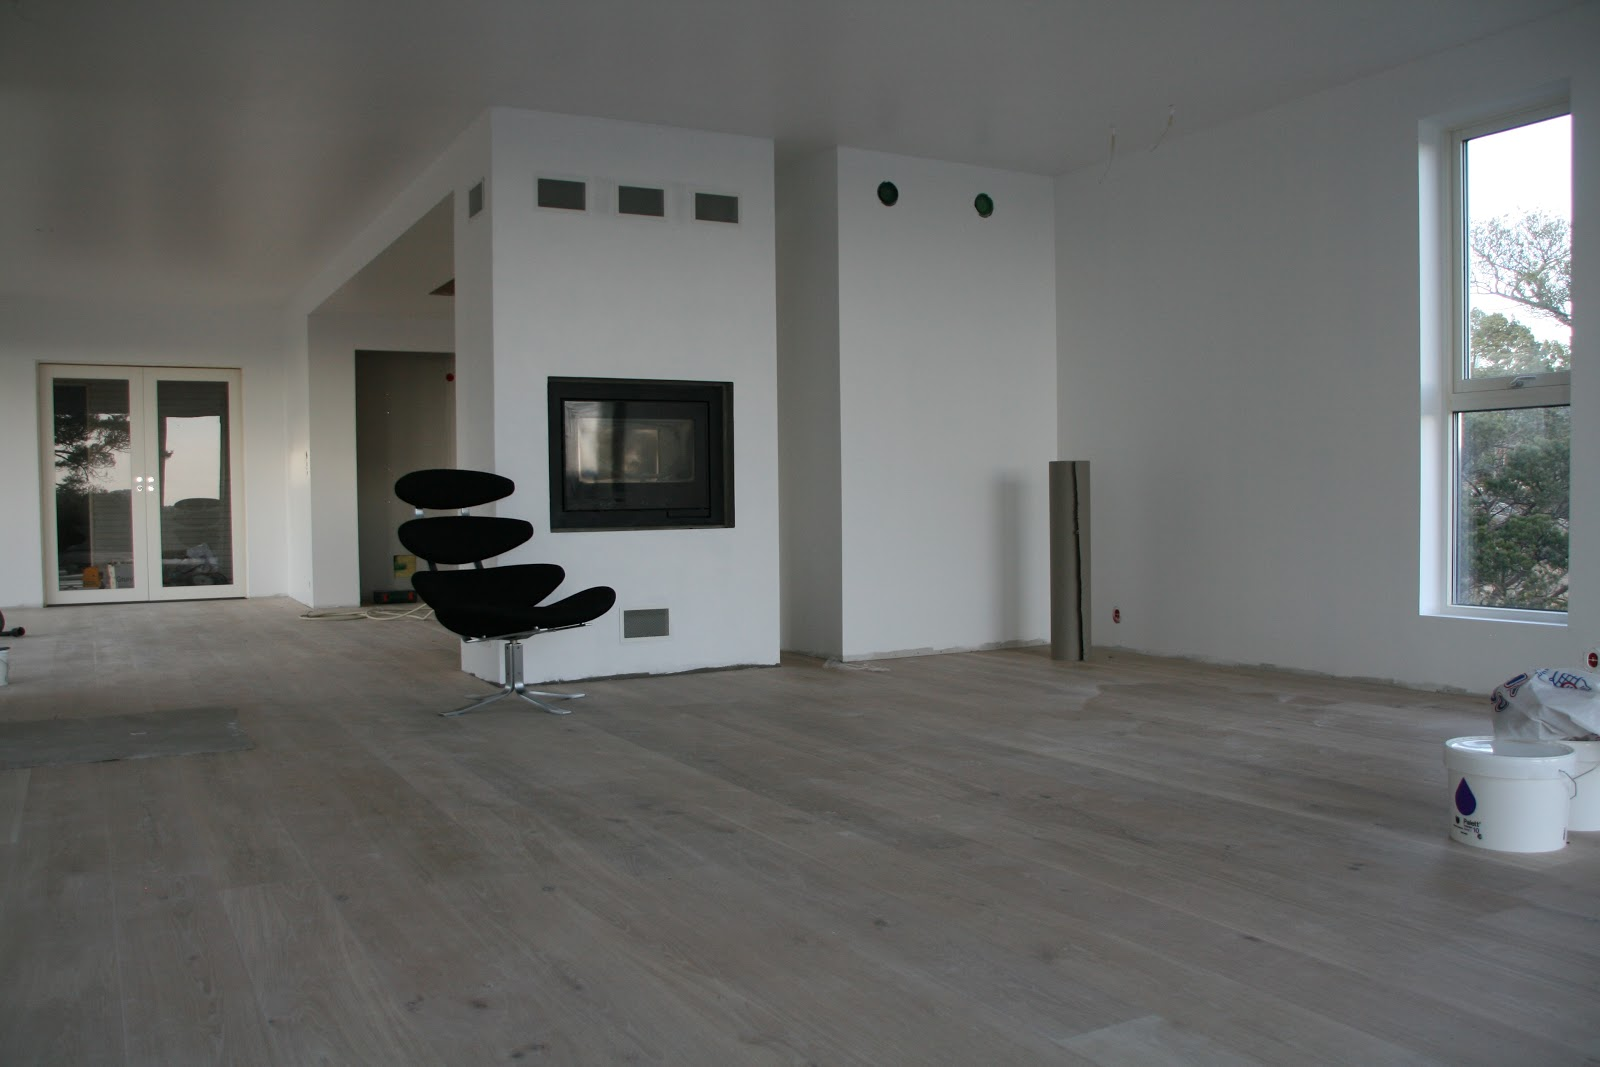 boen parkett furubacken bakeri bryggeri. Black Bedroom Furniture Sets. Home Design Ideas